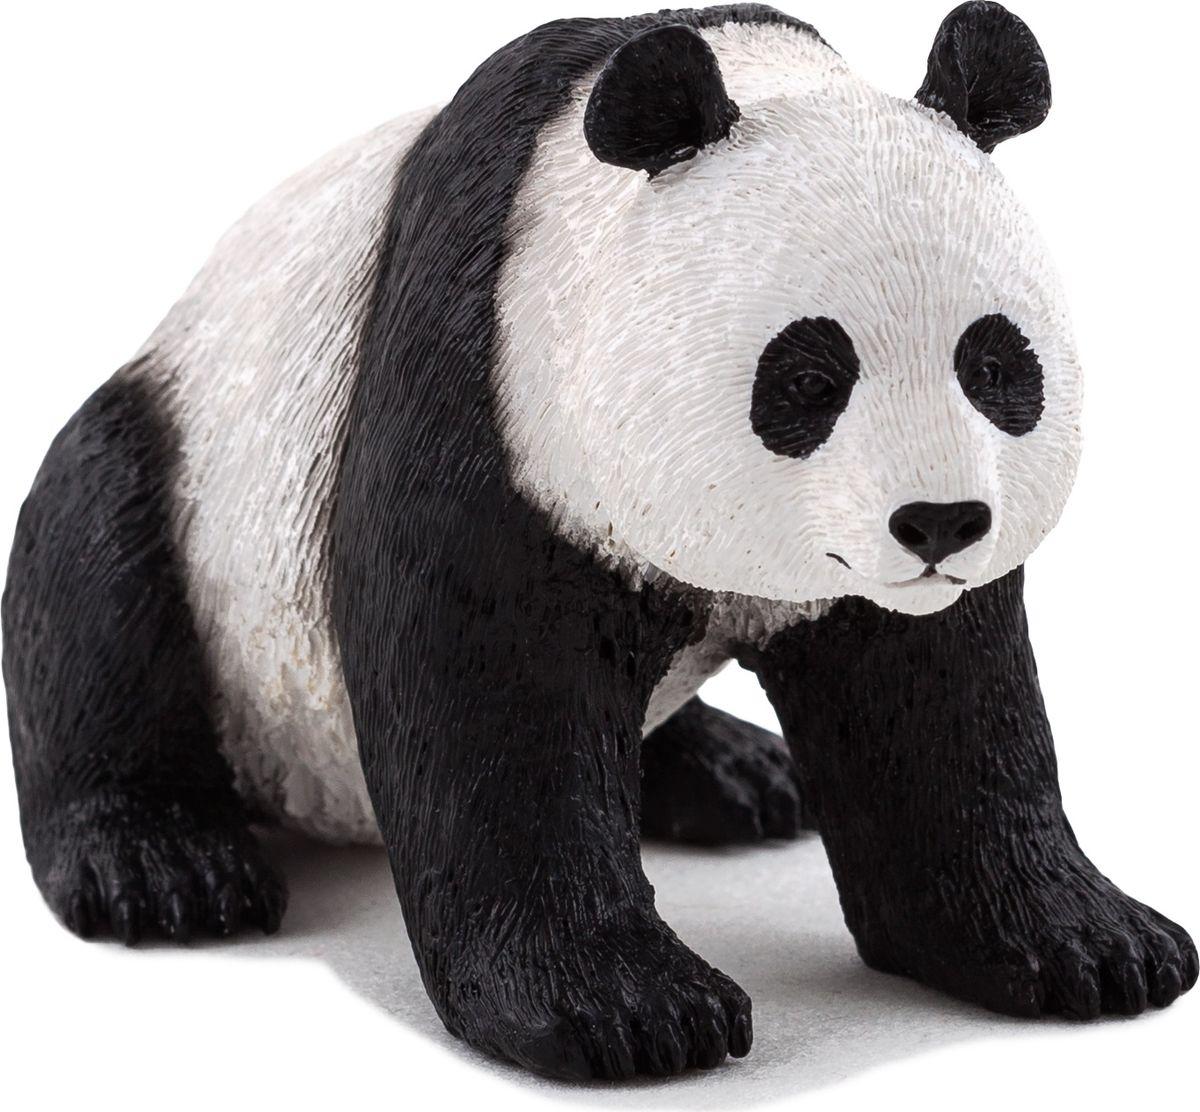 Mojo Фигурка Гигантская панда рюкзак детский mojo pax mojo pax рюкзак boombox с колонками черный белый